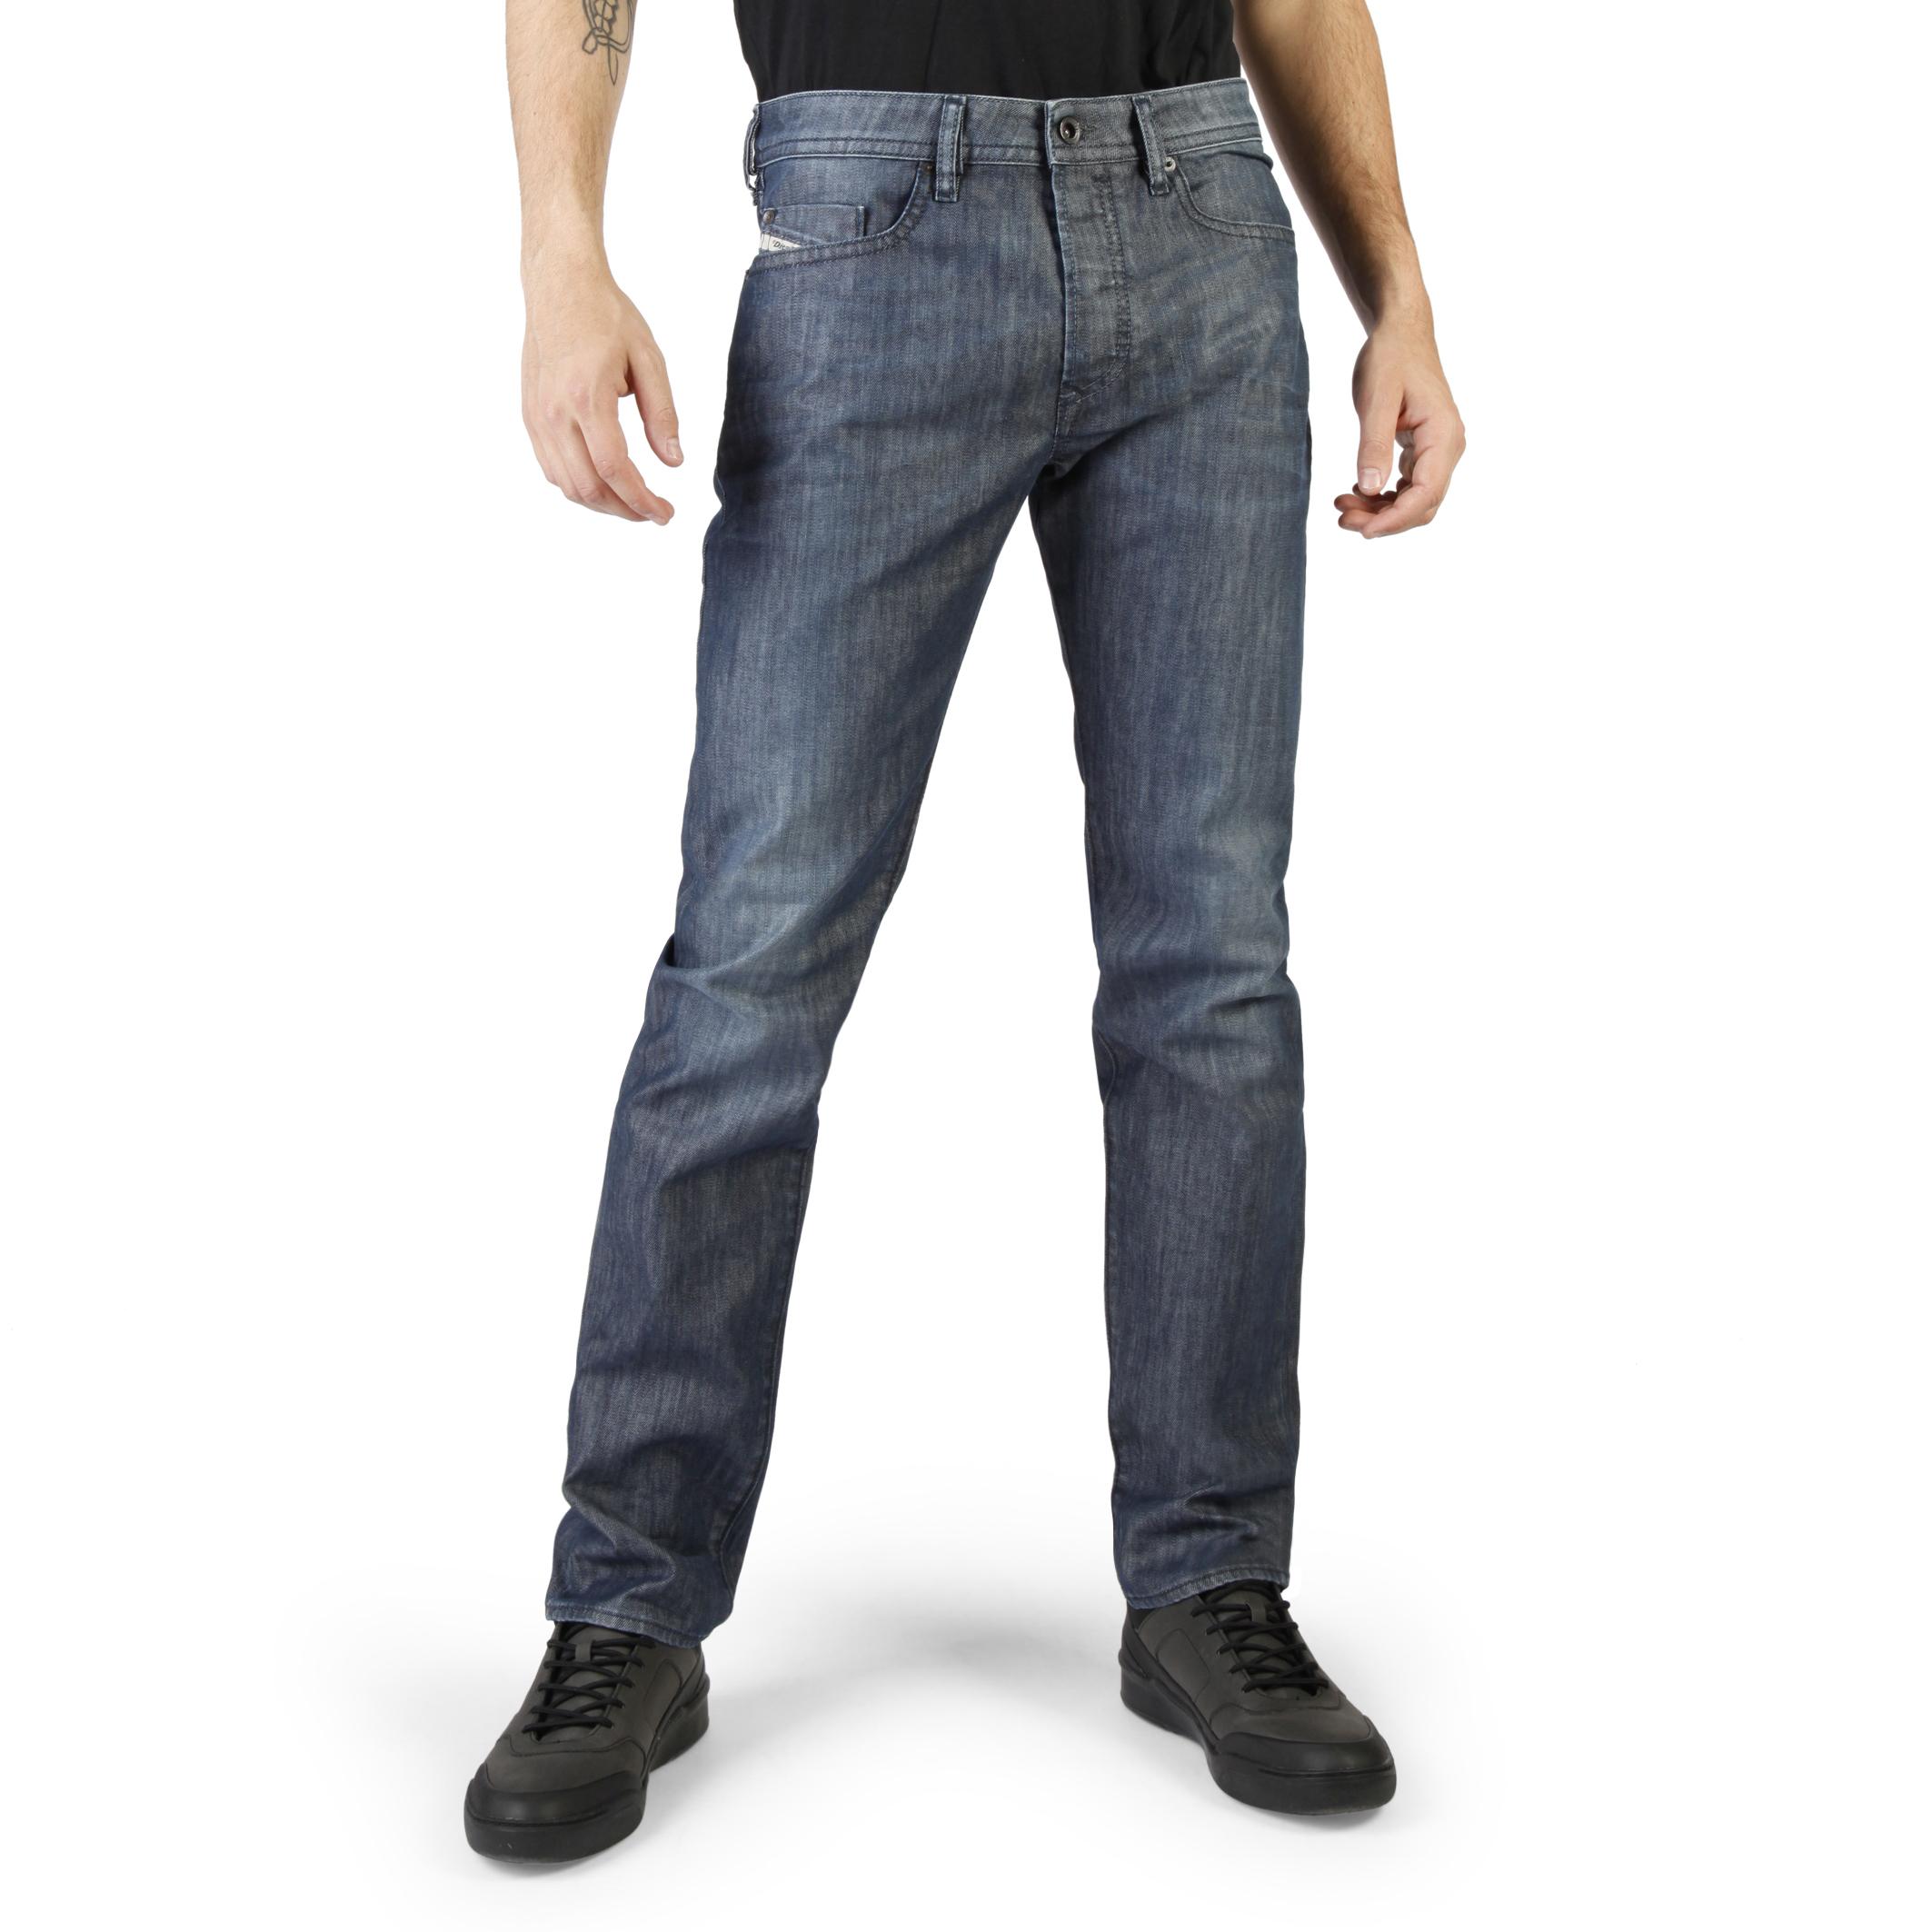 Jeans Diesel BUSTER_L32_00SDHB Uomo Blu 91455